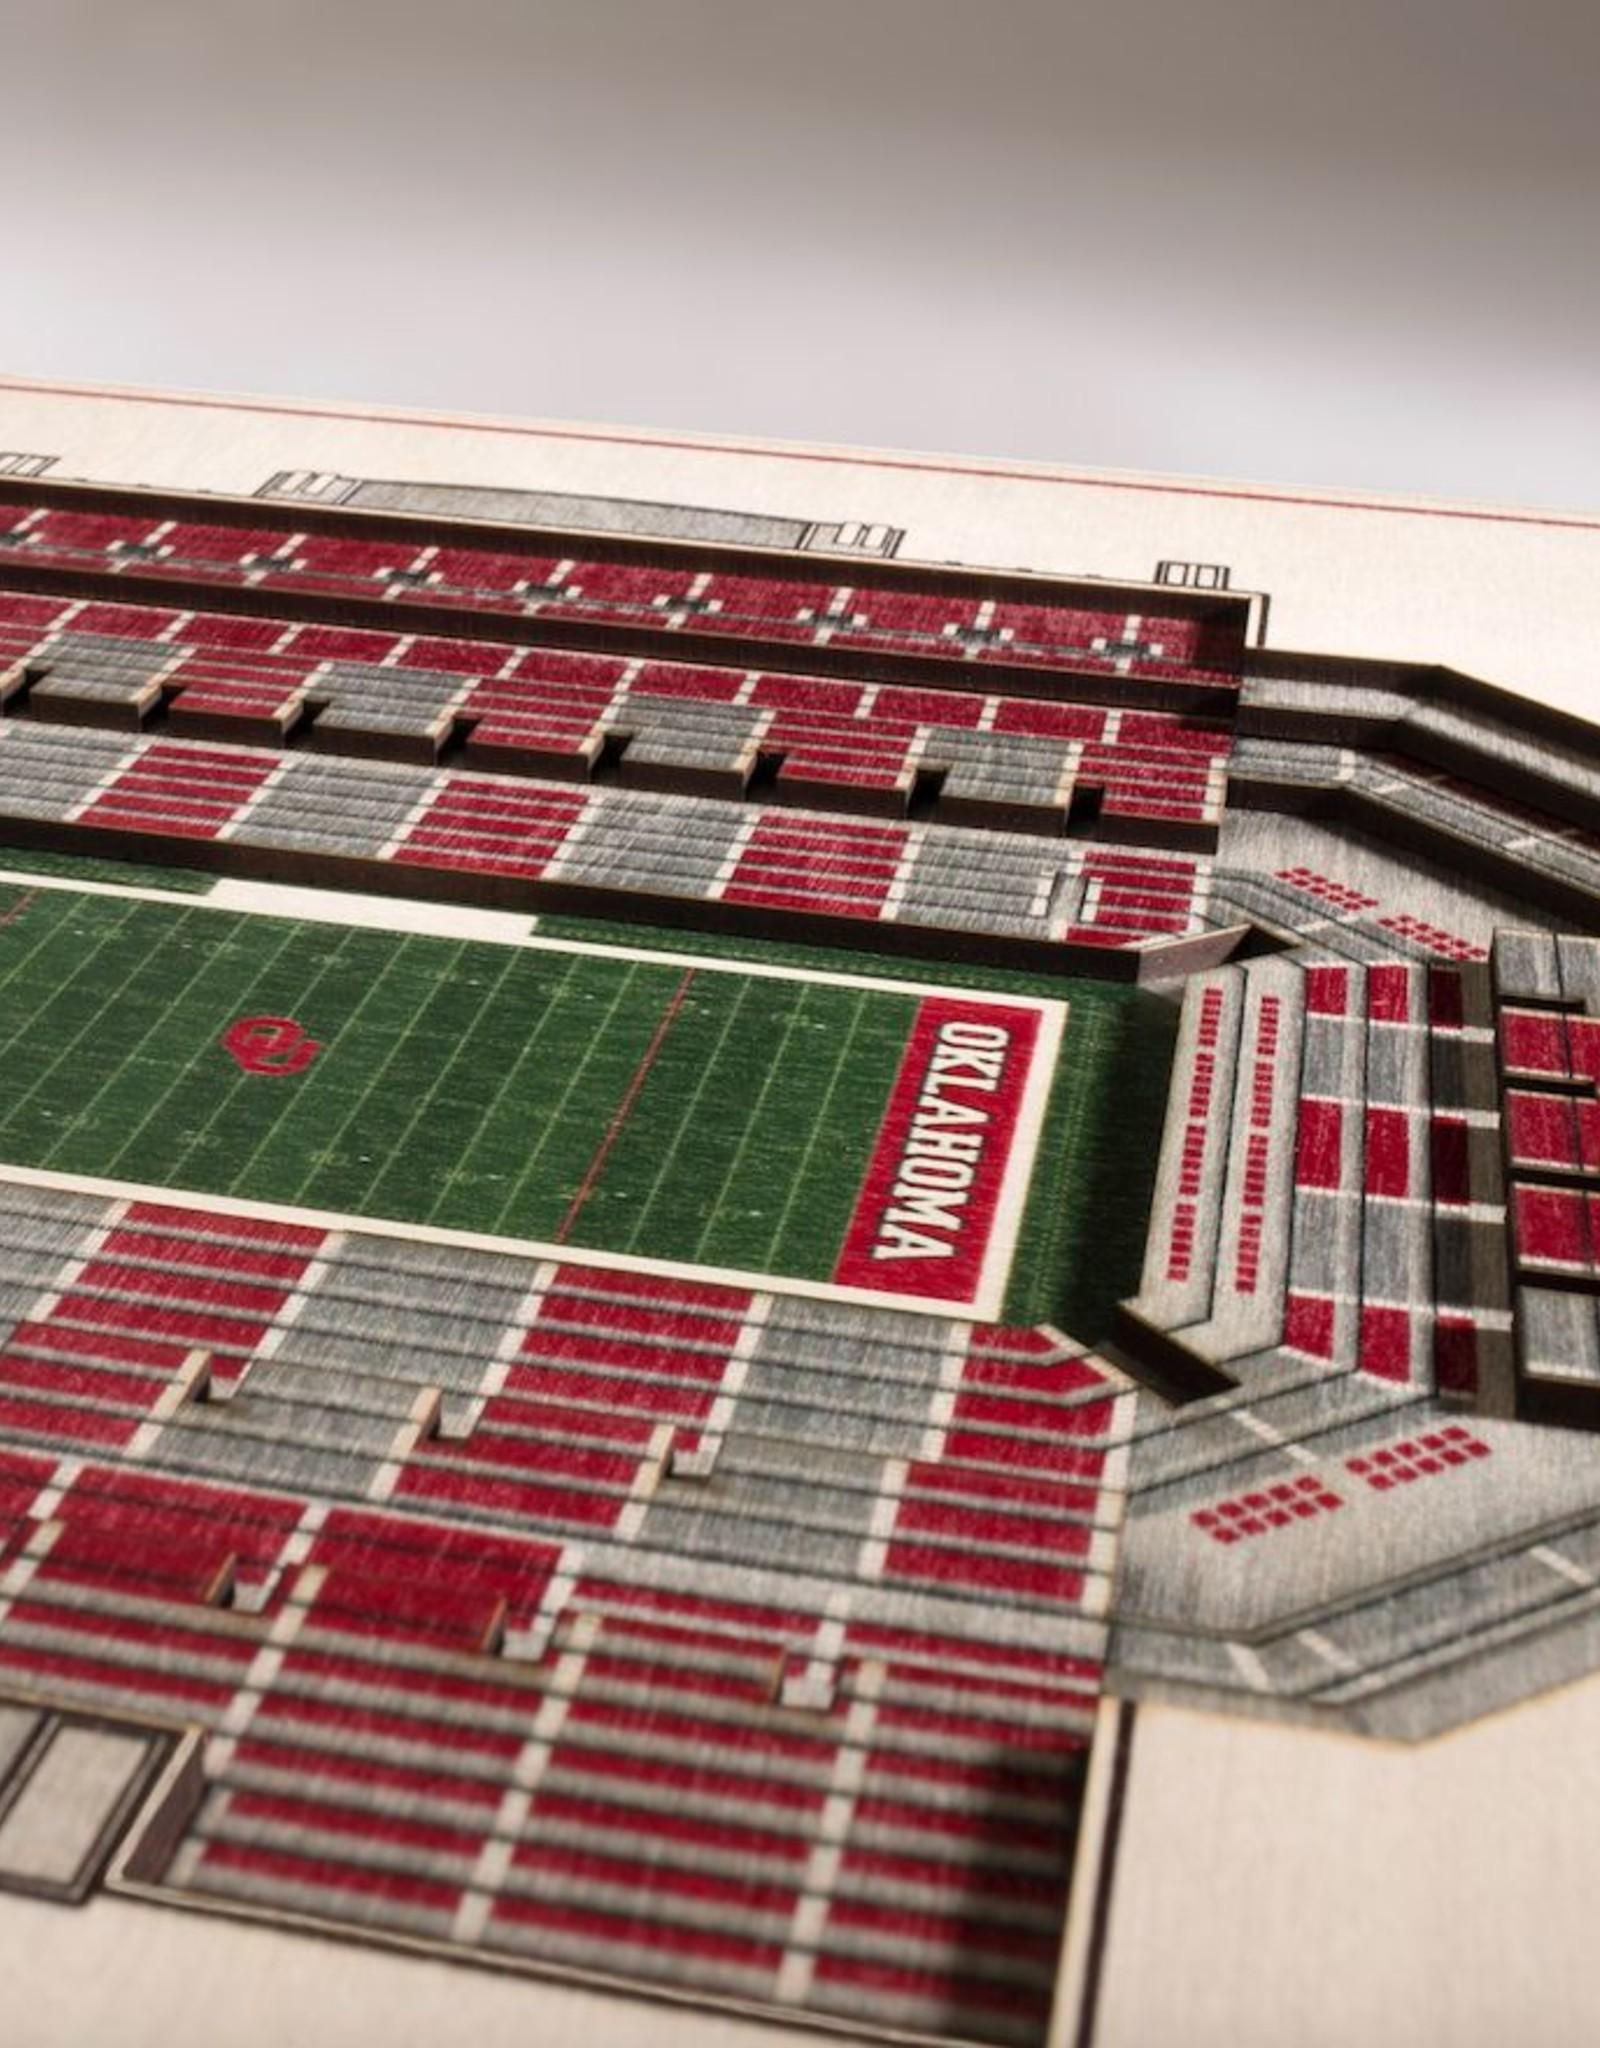 You The Fan OU 5-Layer Stadium View 3D Wall Art